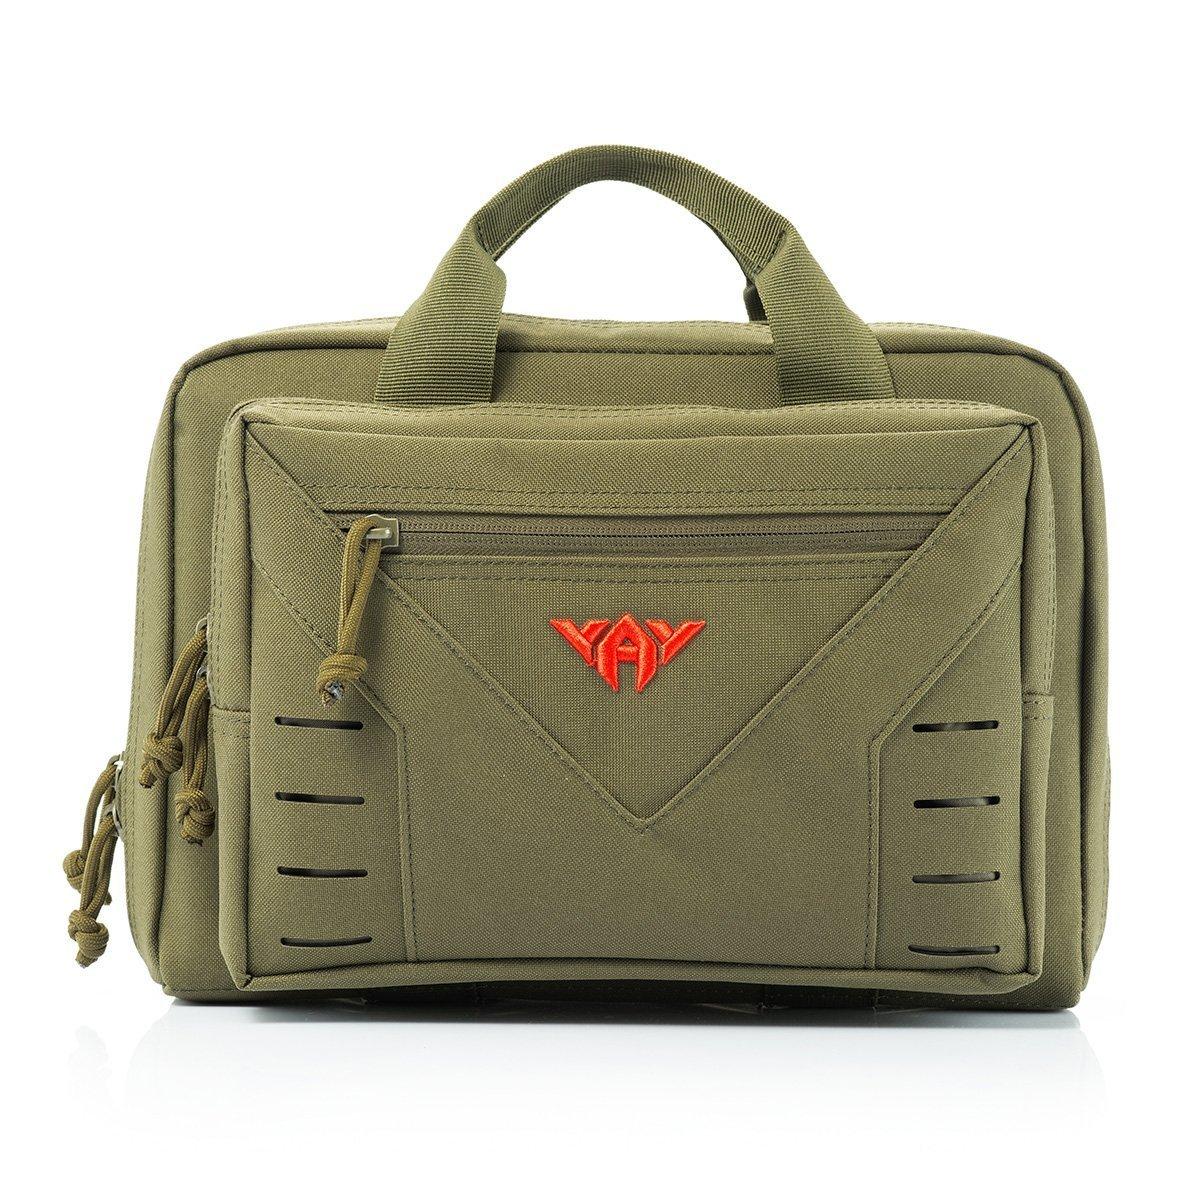 vAv YAKEDA Tactical Pistol Case Shooting Gun Range Duffle Bag Handgun Magazine Pouch 10L